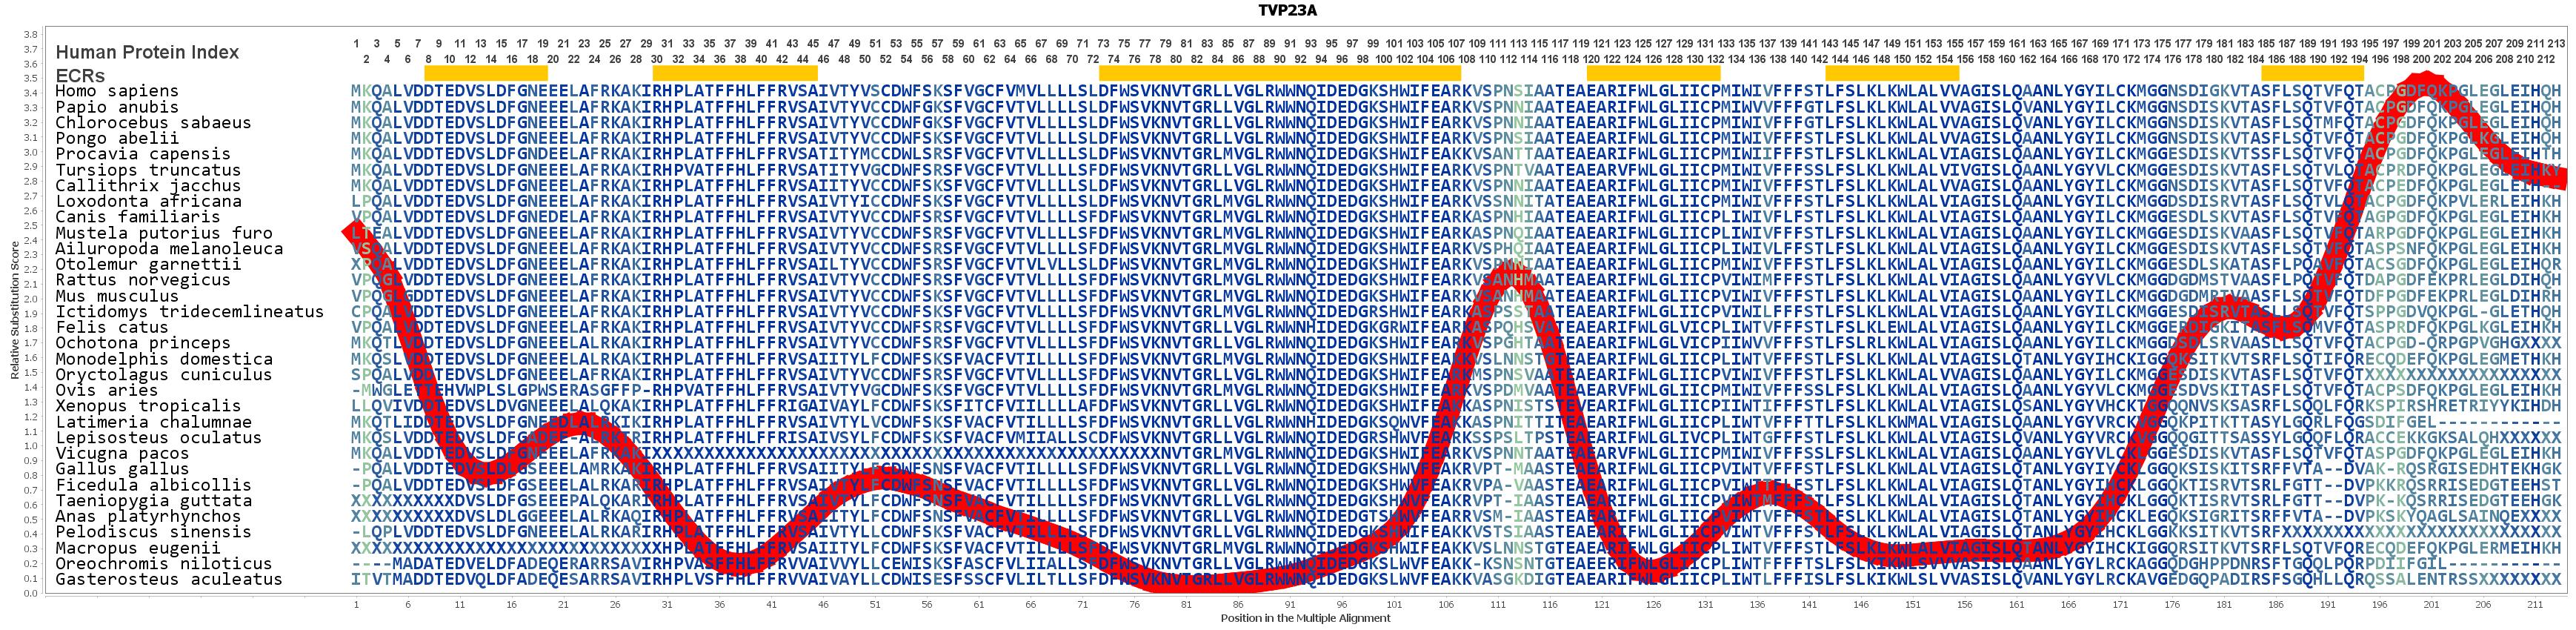 Evolution for TVP23A Gene